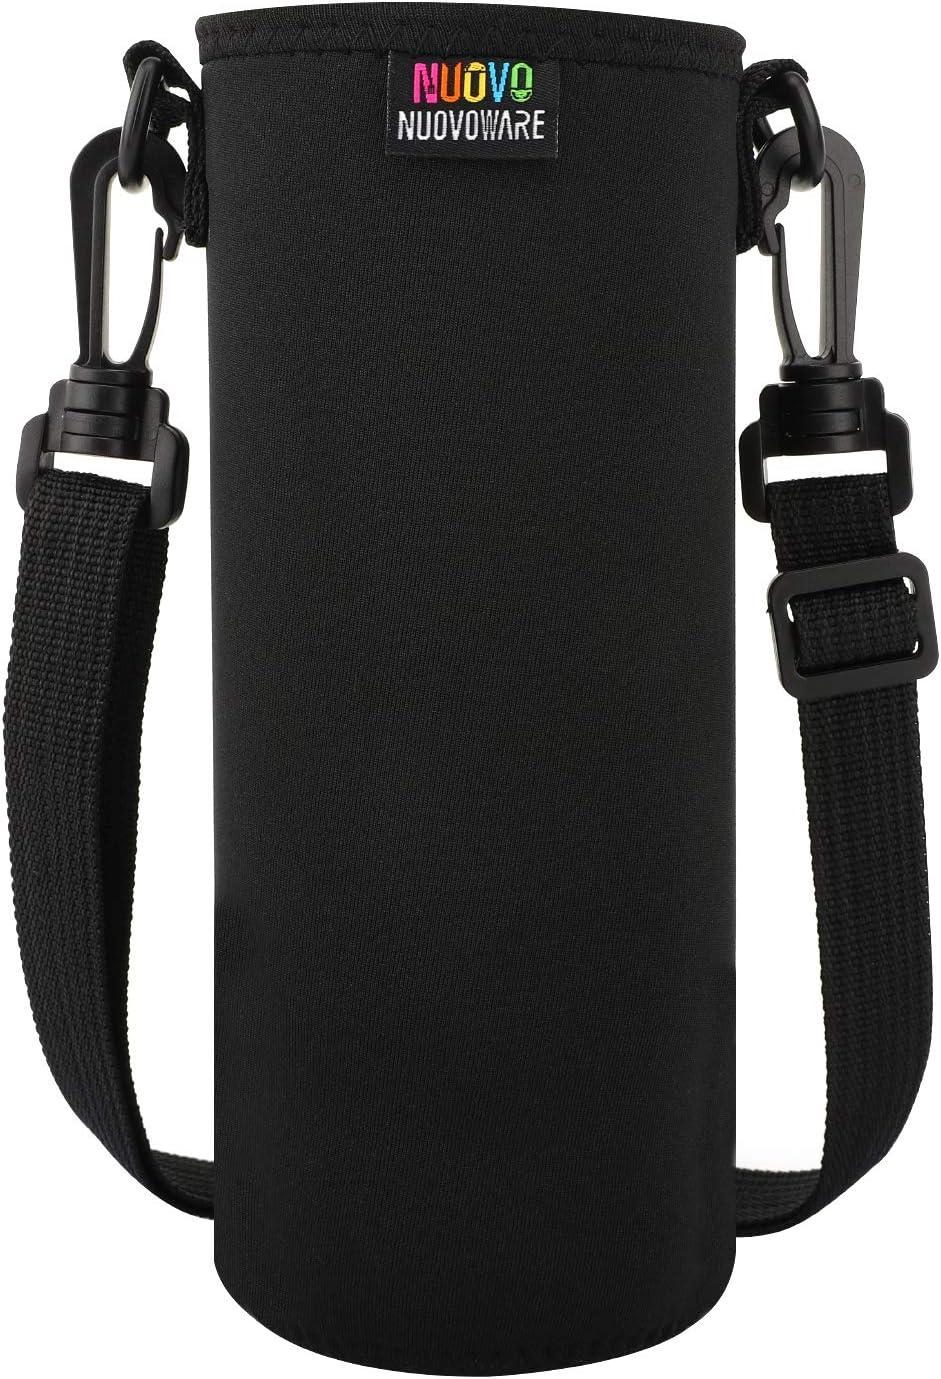 Nuovoware Water Bottle Carrier, Premium Neoprene Portable Insulated Water Bottle Holder Bag 1000ML with Adjustable Shoulder Strap Fit Stainless Steel, Plastic Bottles & More, Large Size, Black